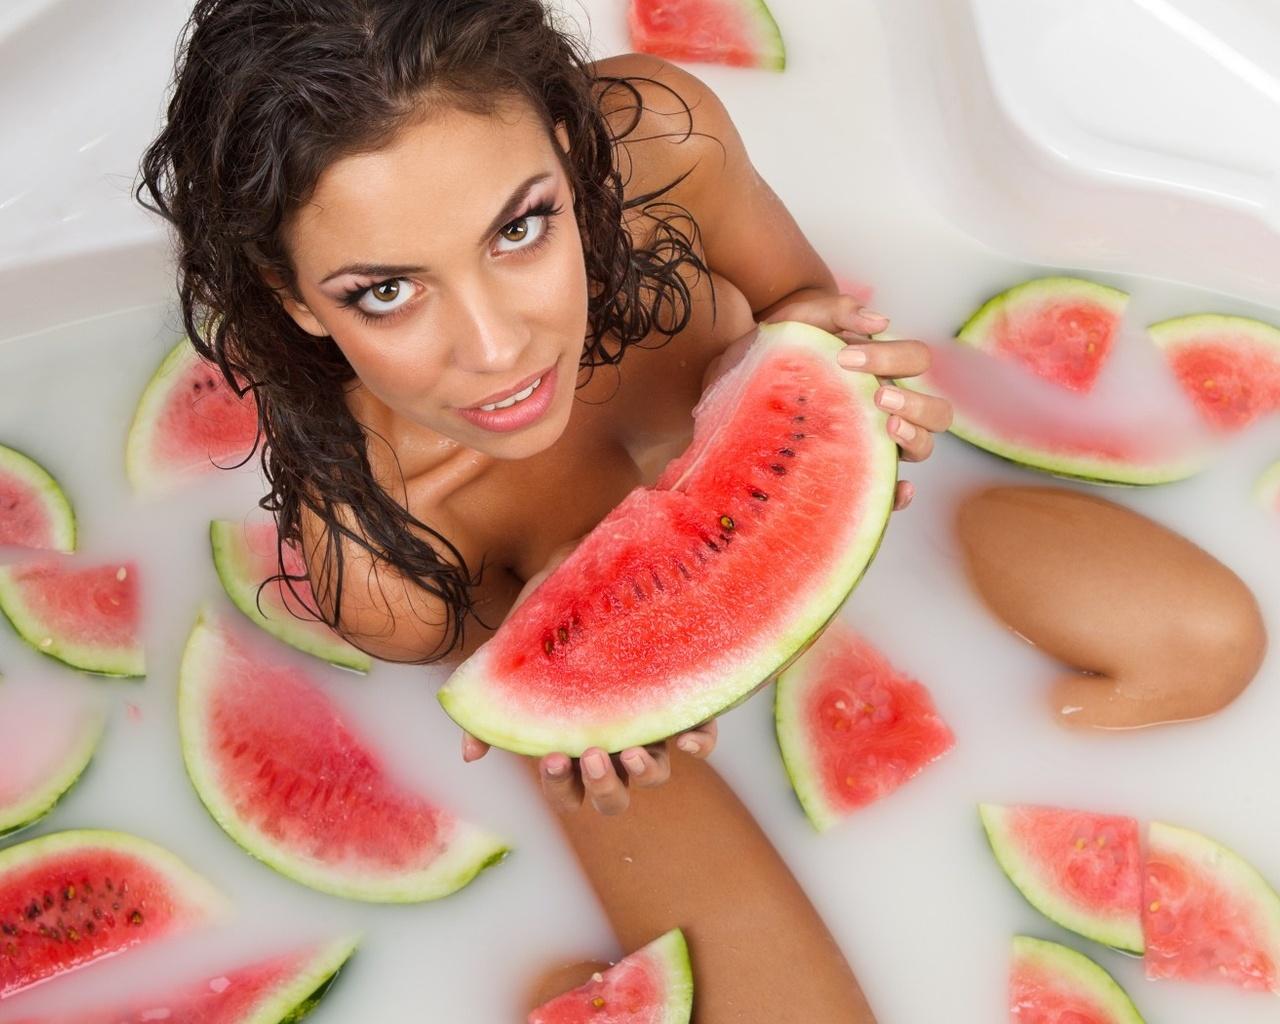 Лесби с фруктами